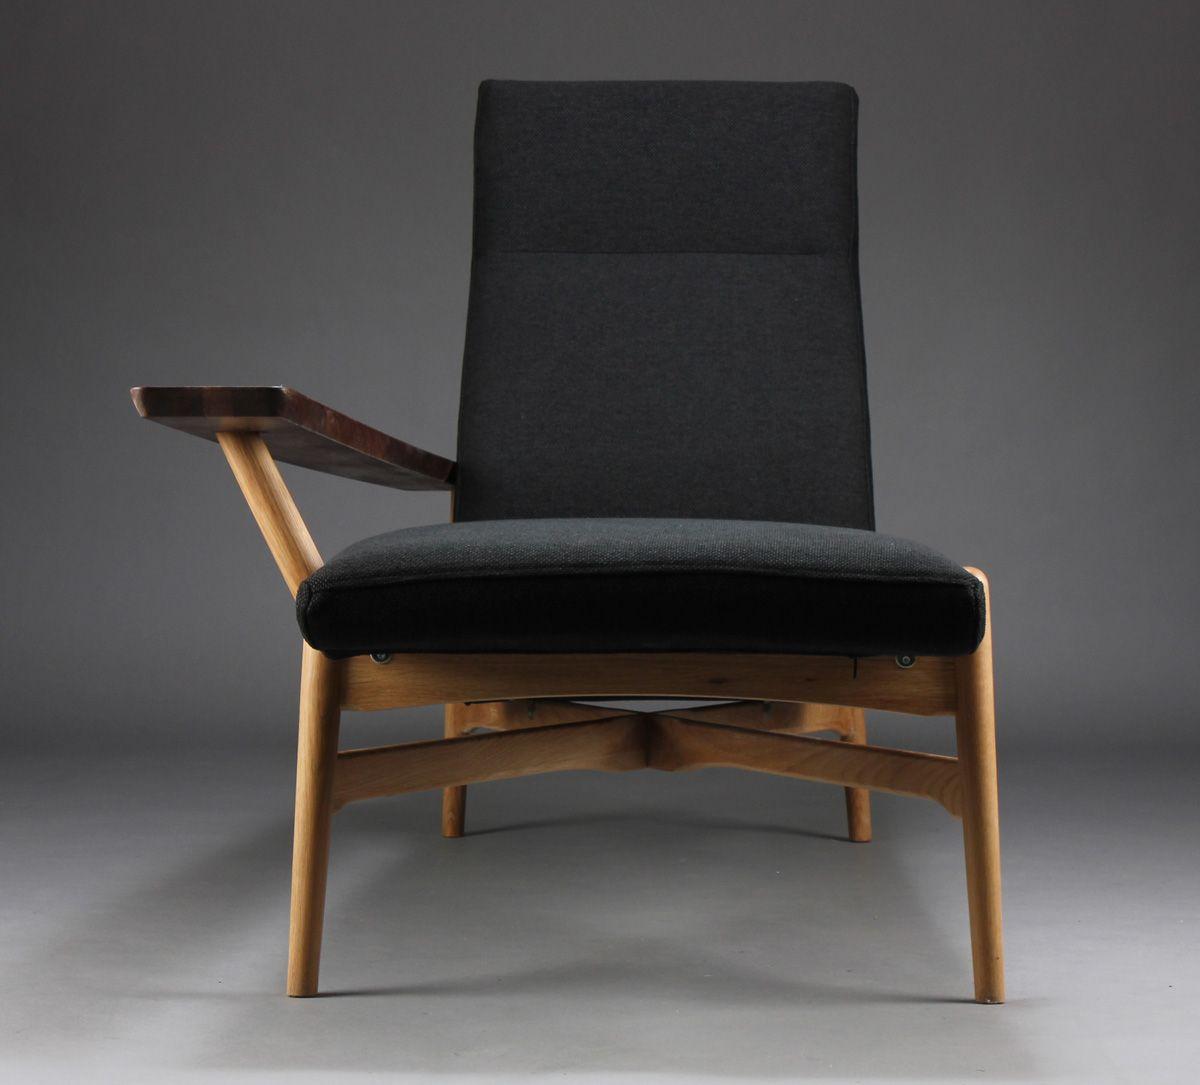 Chaise longueeasy chair crosslegged base oak and